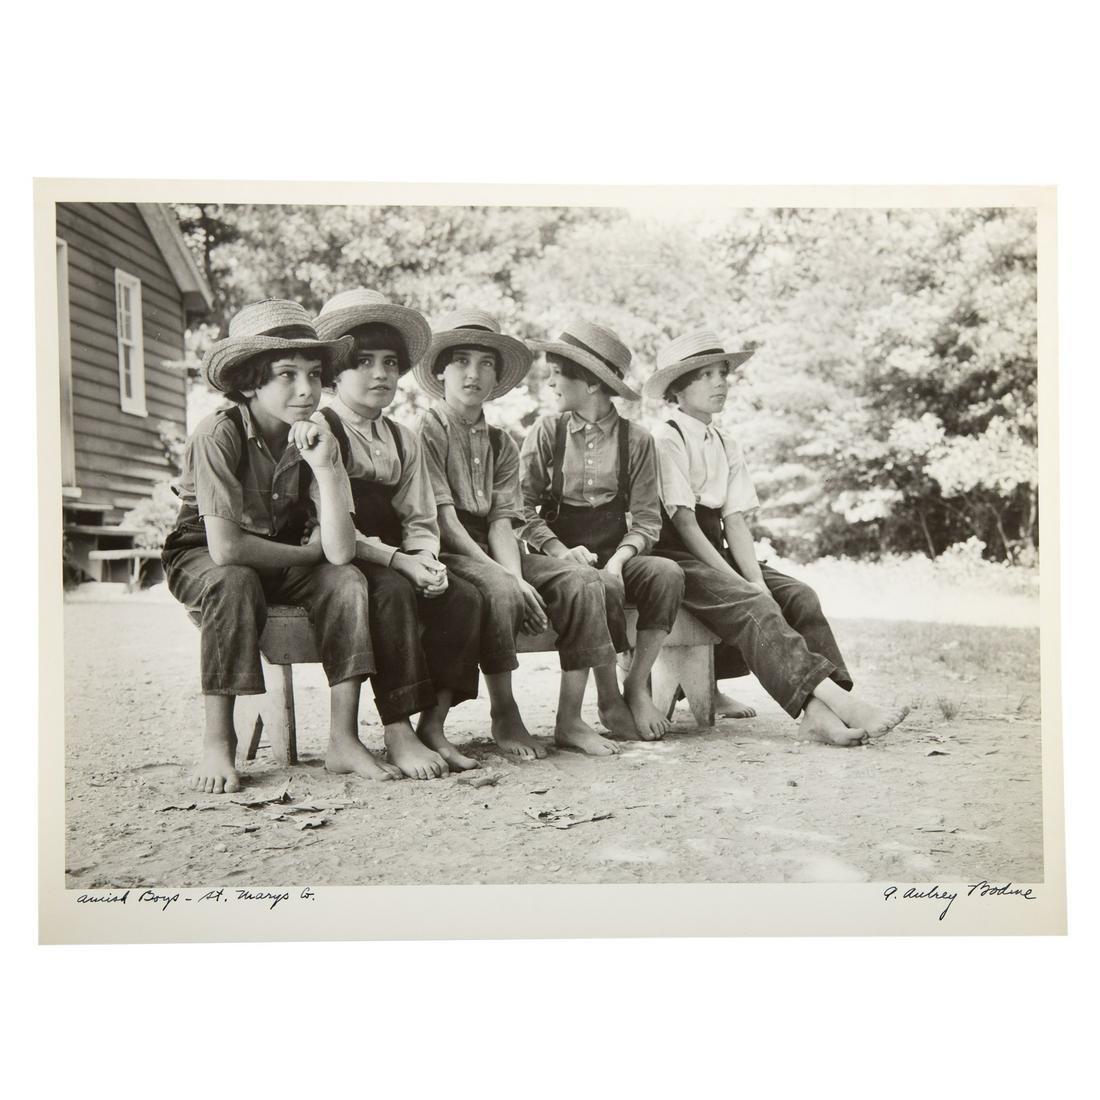 A. Aubrey Bodine. Amish Boys-St. Mary